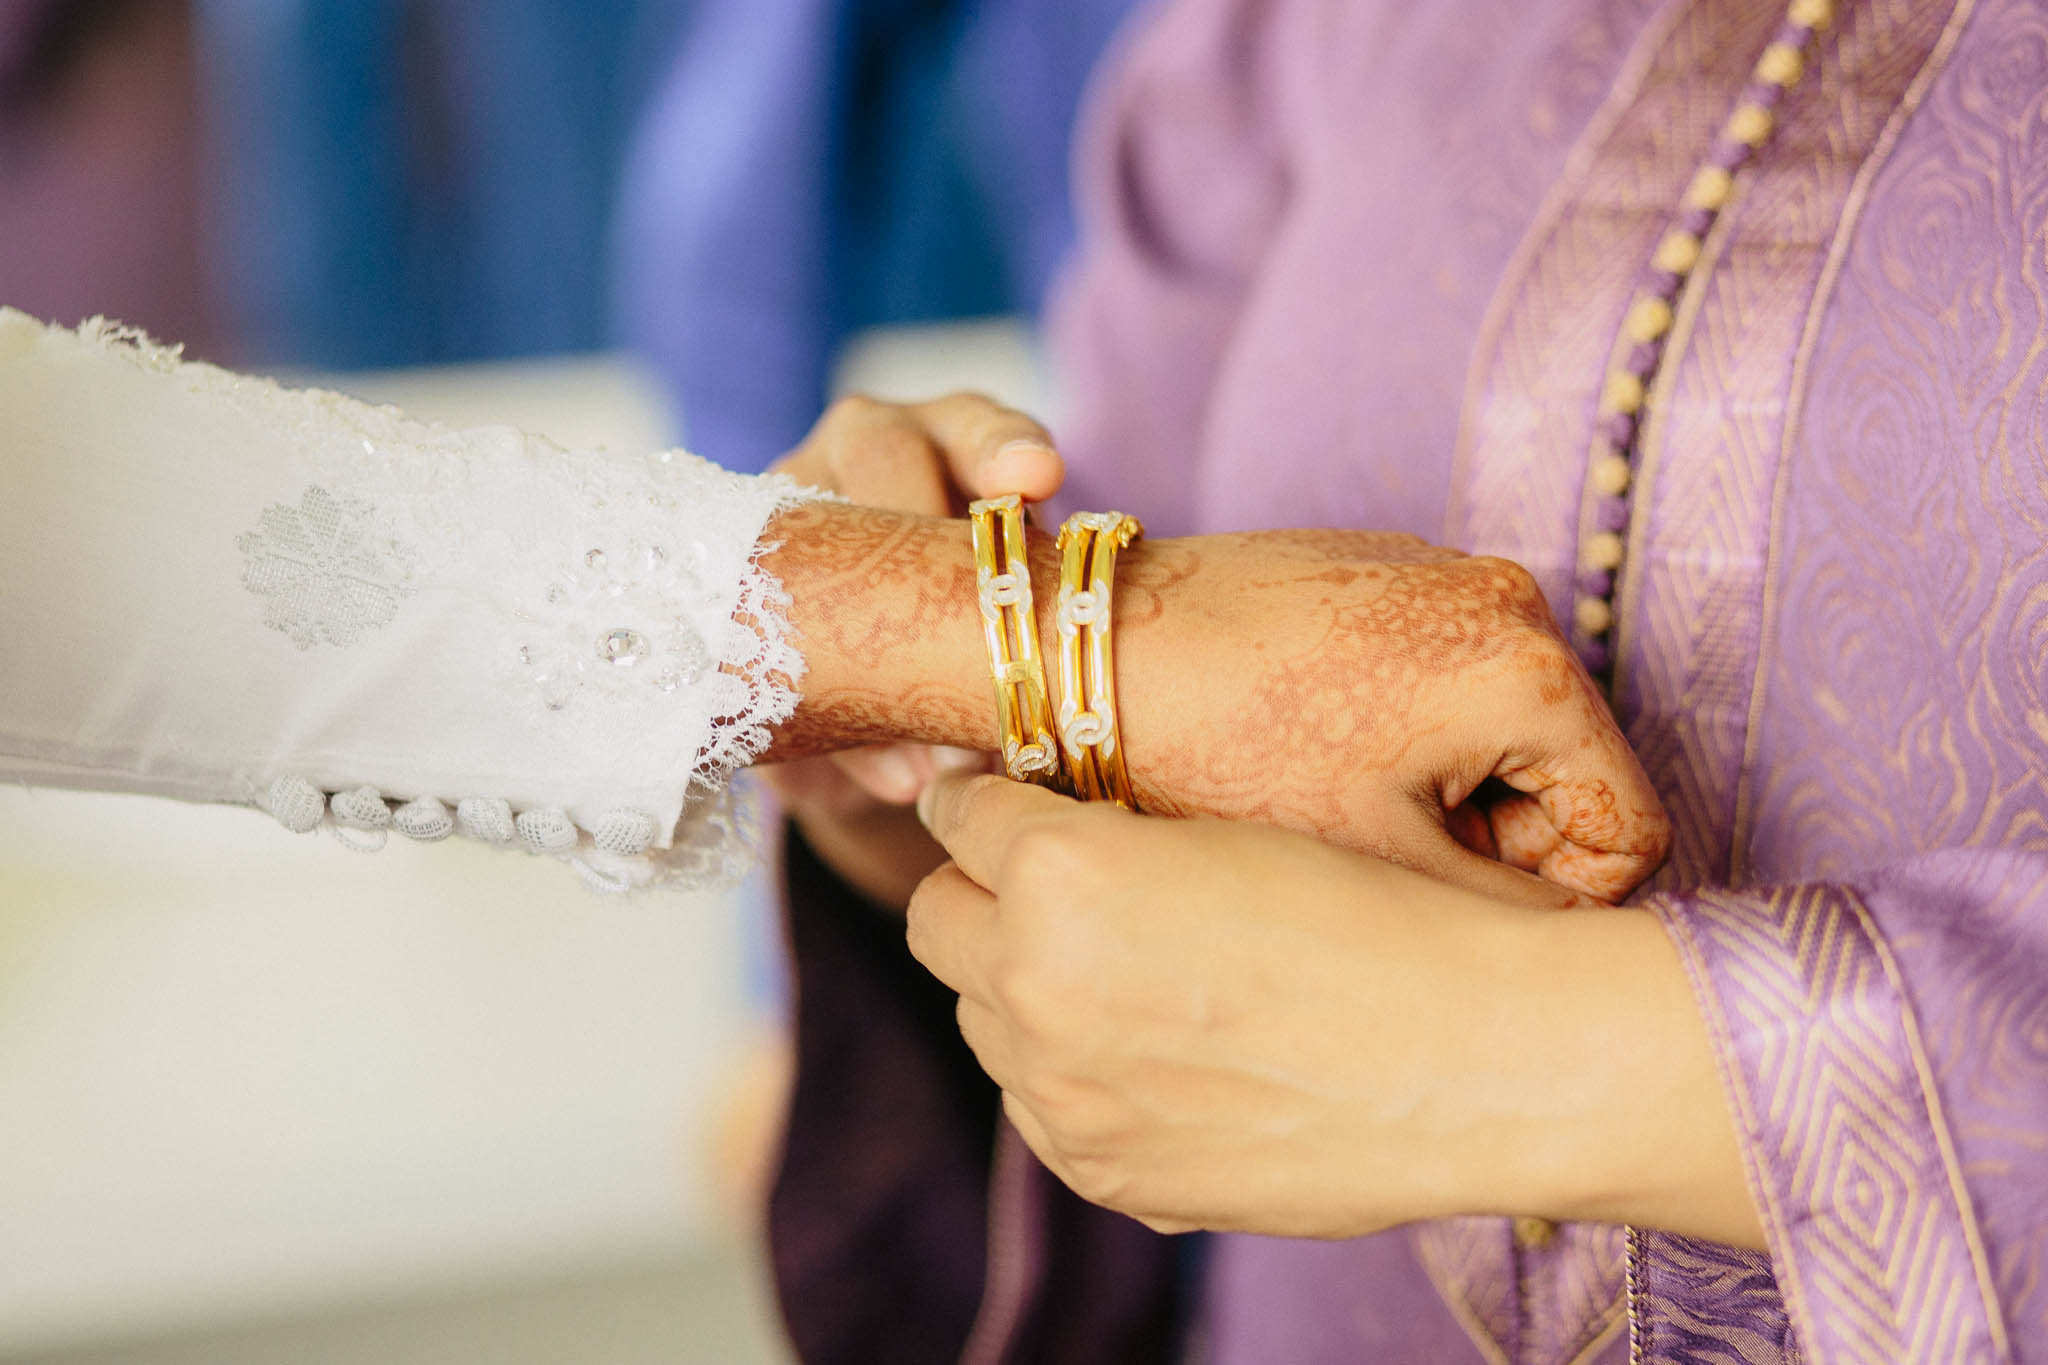 singapore-wedding-photographer-malay-indian-pre-wedding-travel-wmt-2015-shereen-farid-13.jpg